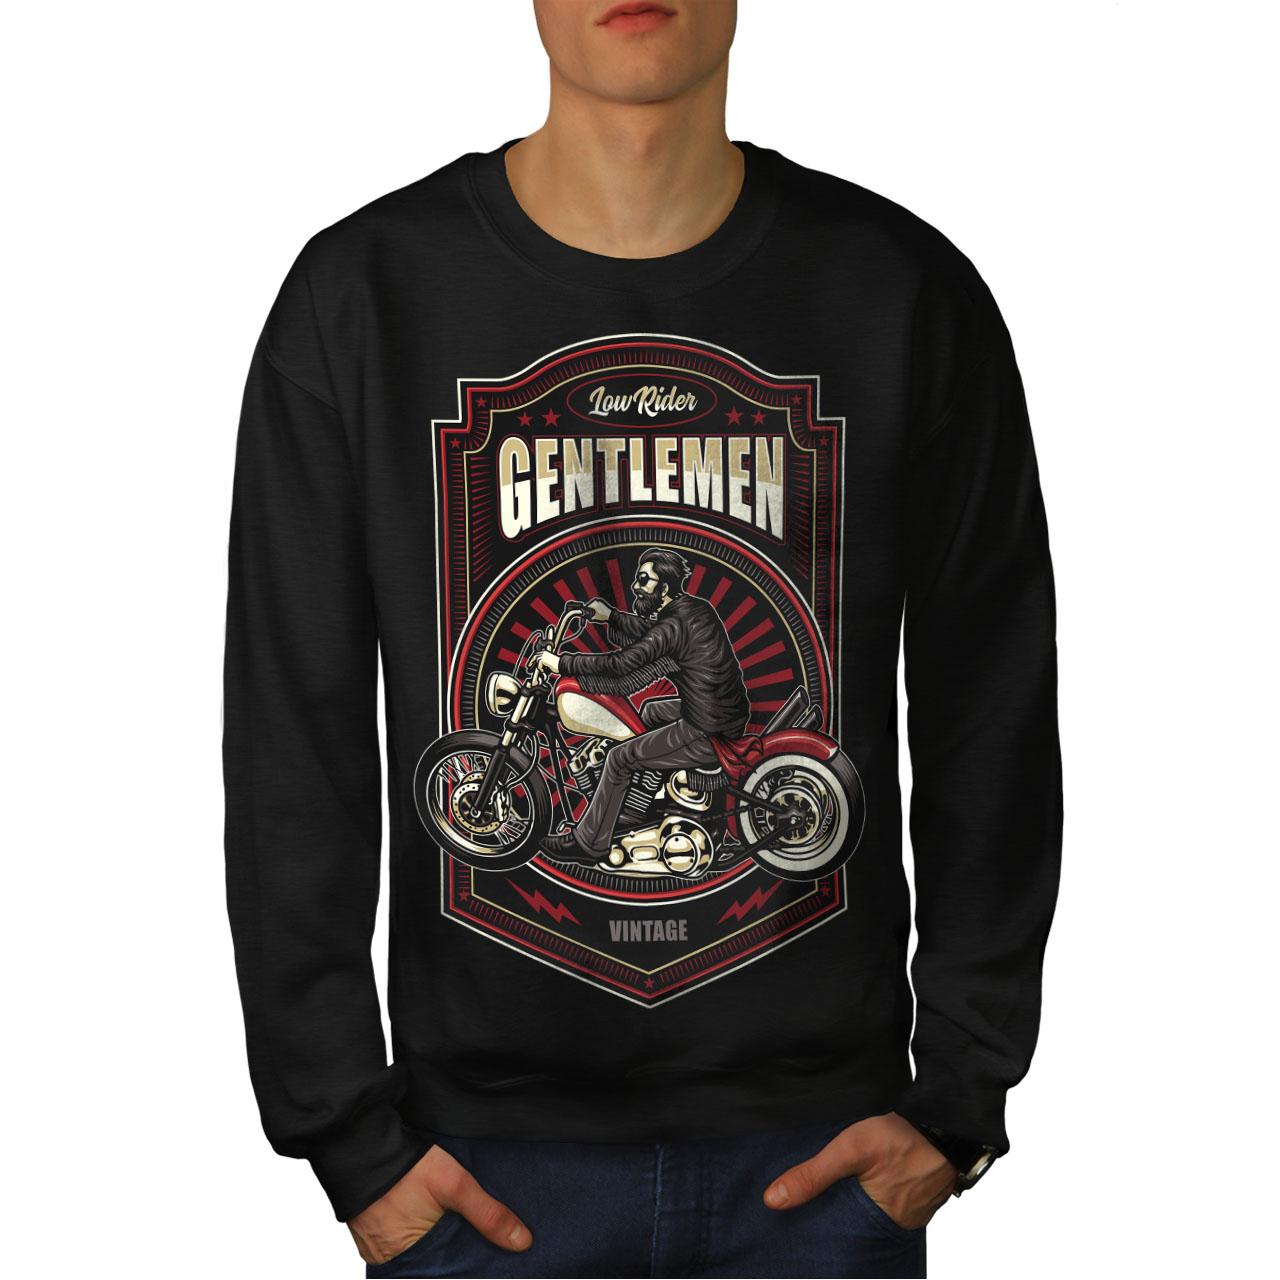 Pullover Jumper wellcoda Space Biker Night Fashion Womens Sweatshirt